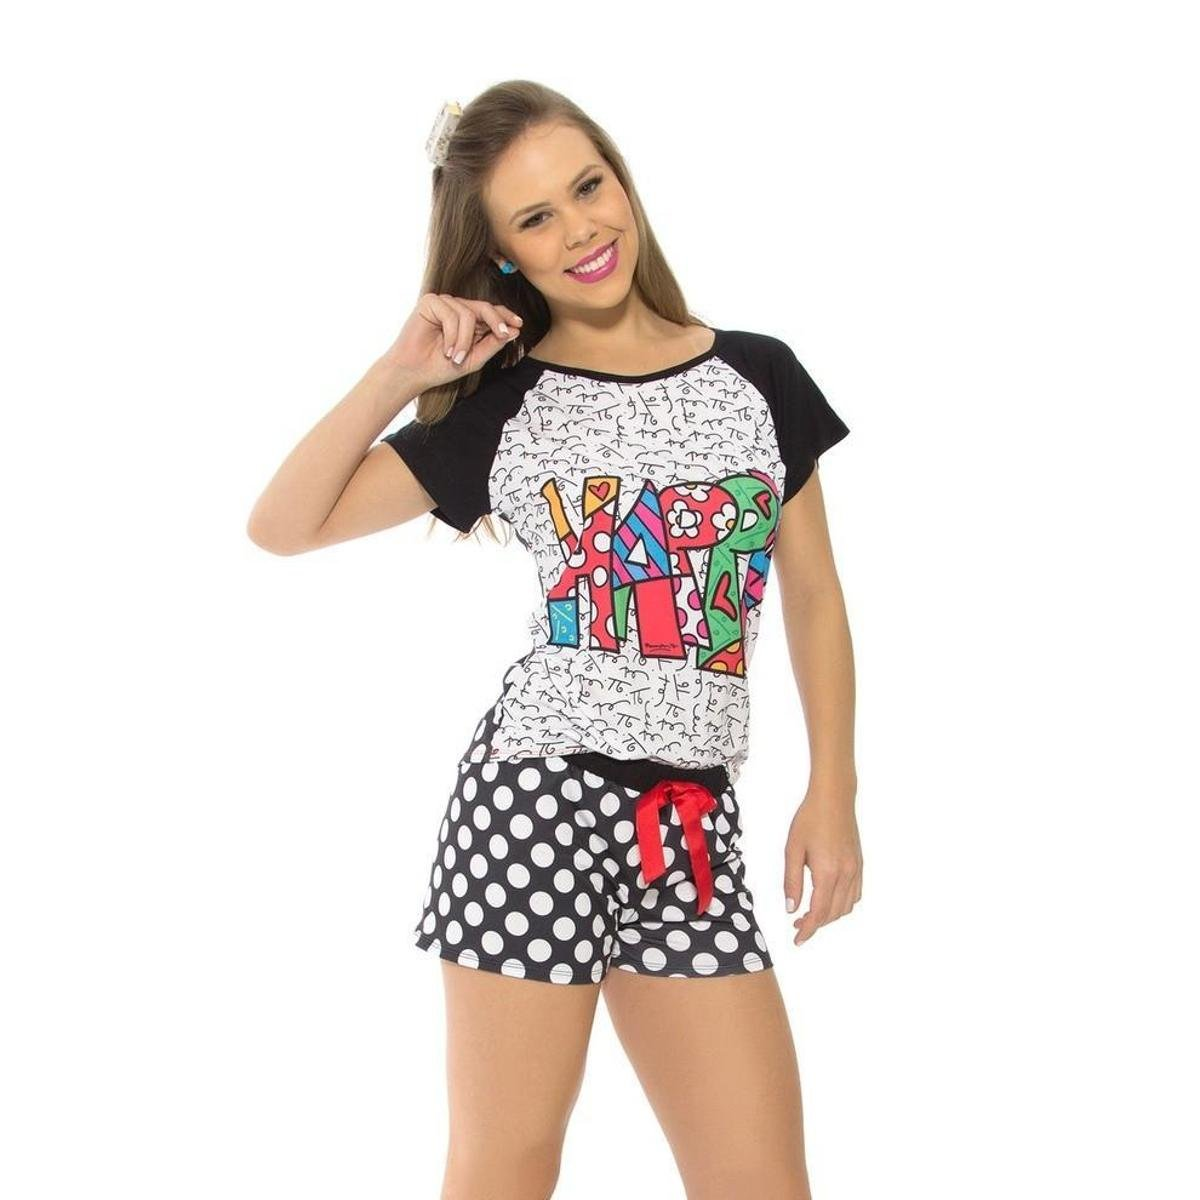 Pijama Pijama Femino Recco Preto 09175 Recco Femino Verão Curto Curto w5gxAqZa